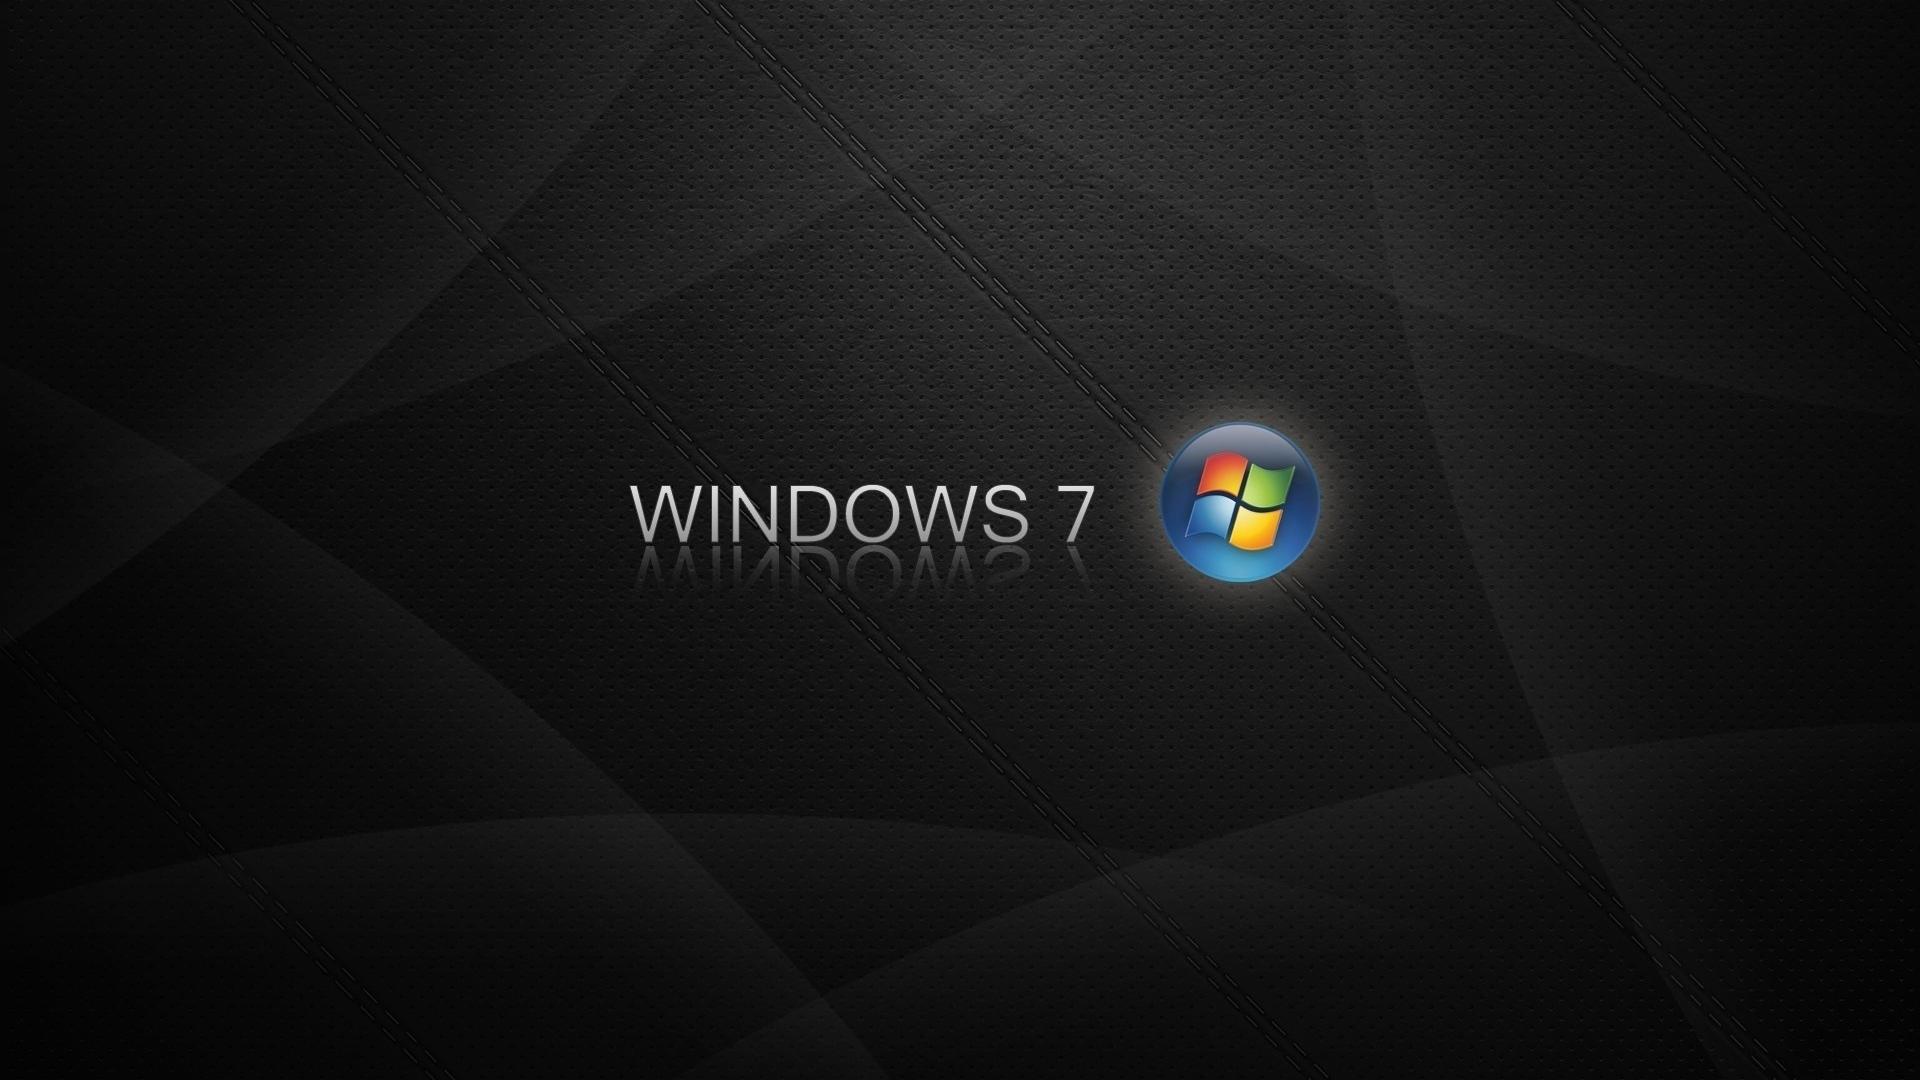 Windows 7 Wallpaper 57 1920x1080